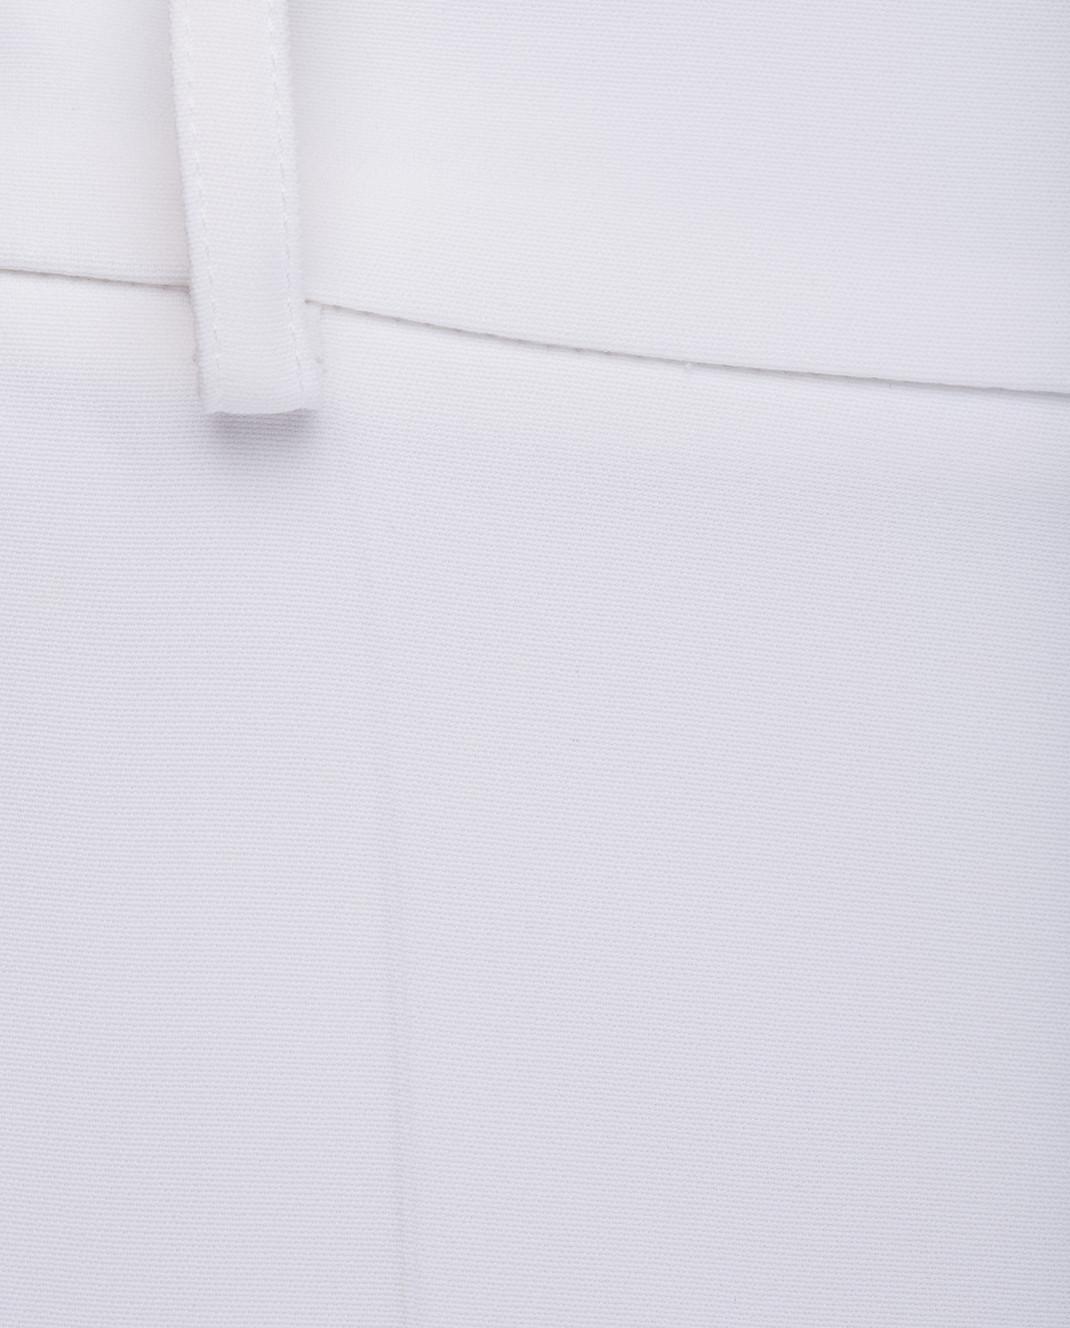 Blumarine Белые брюки 6359 изображение 5